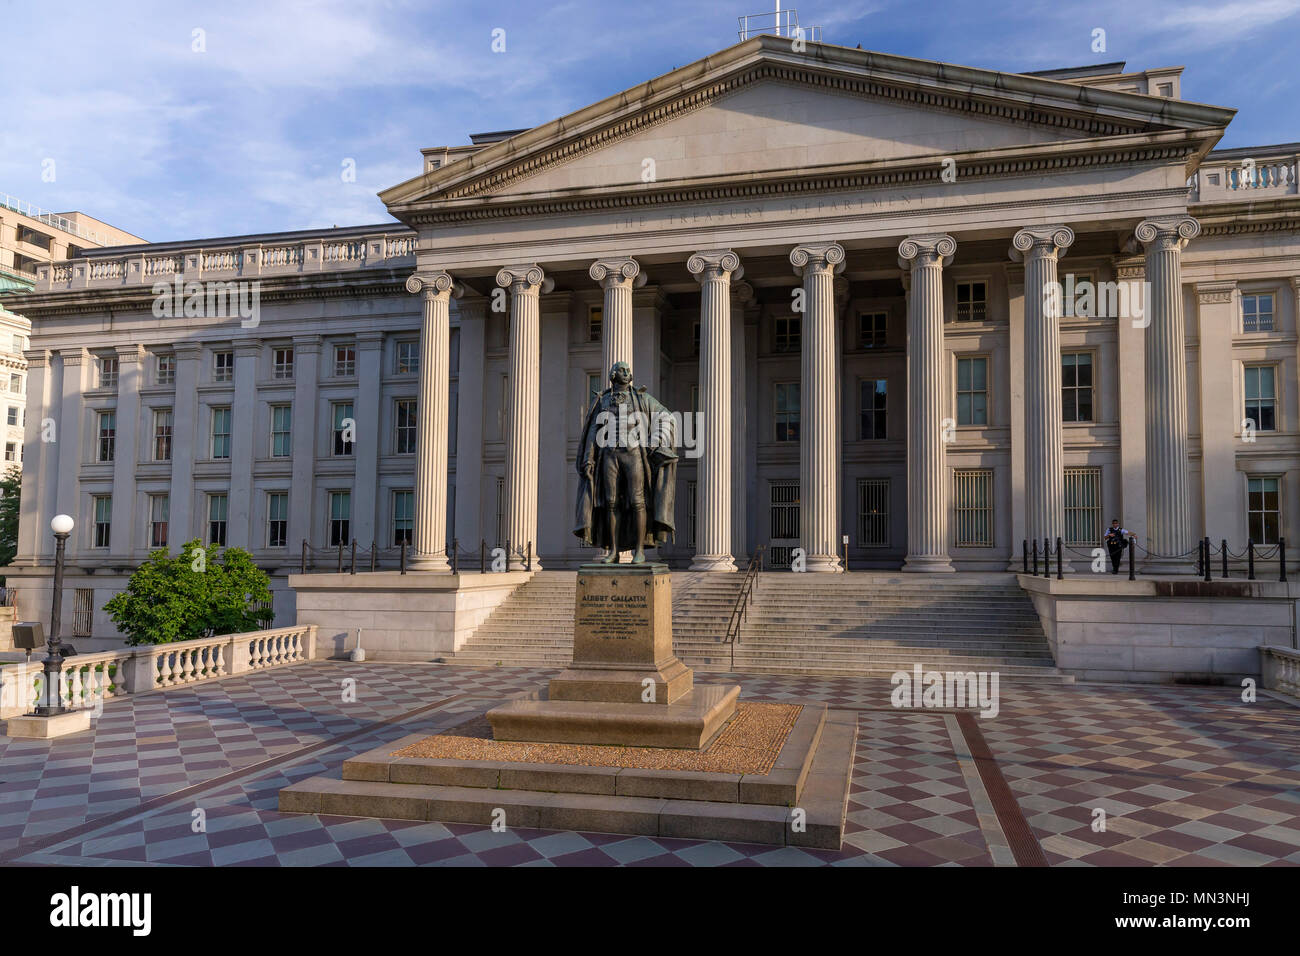 Statue of Albert Gallatin, Secretary of the Treasury, Treasury Department, Washington DC, USA, North America - Stock Image